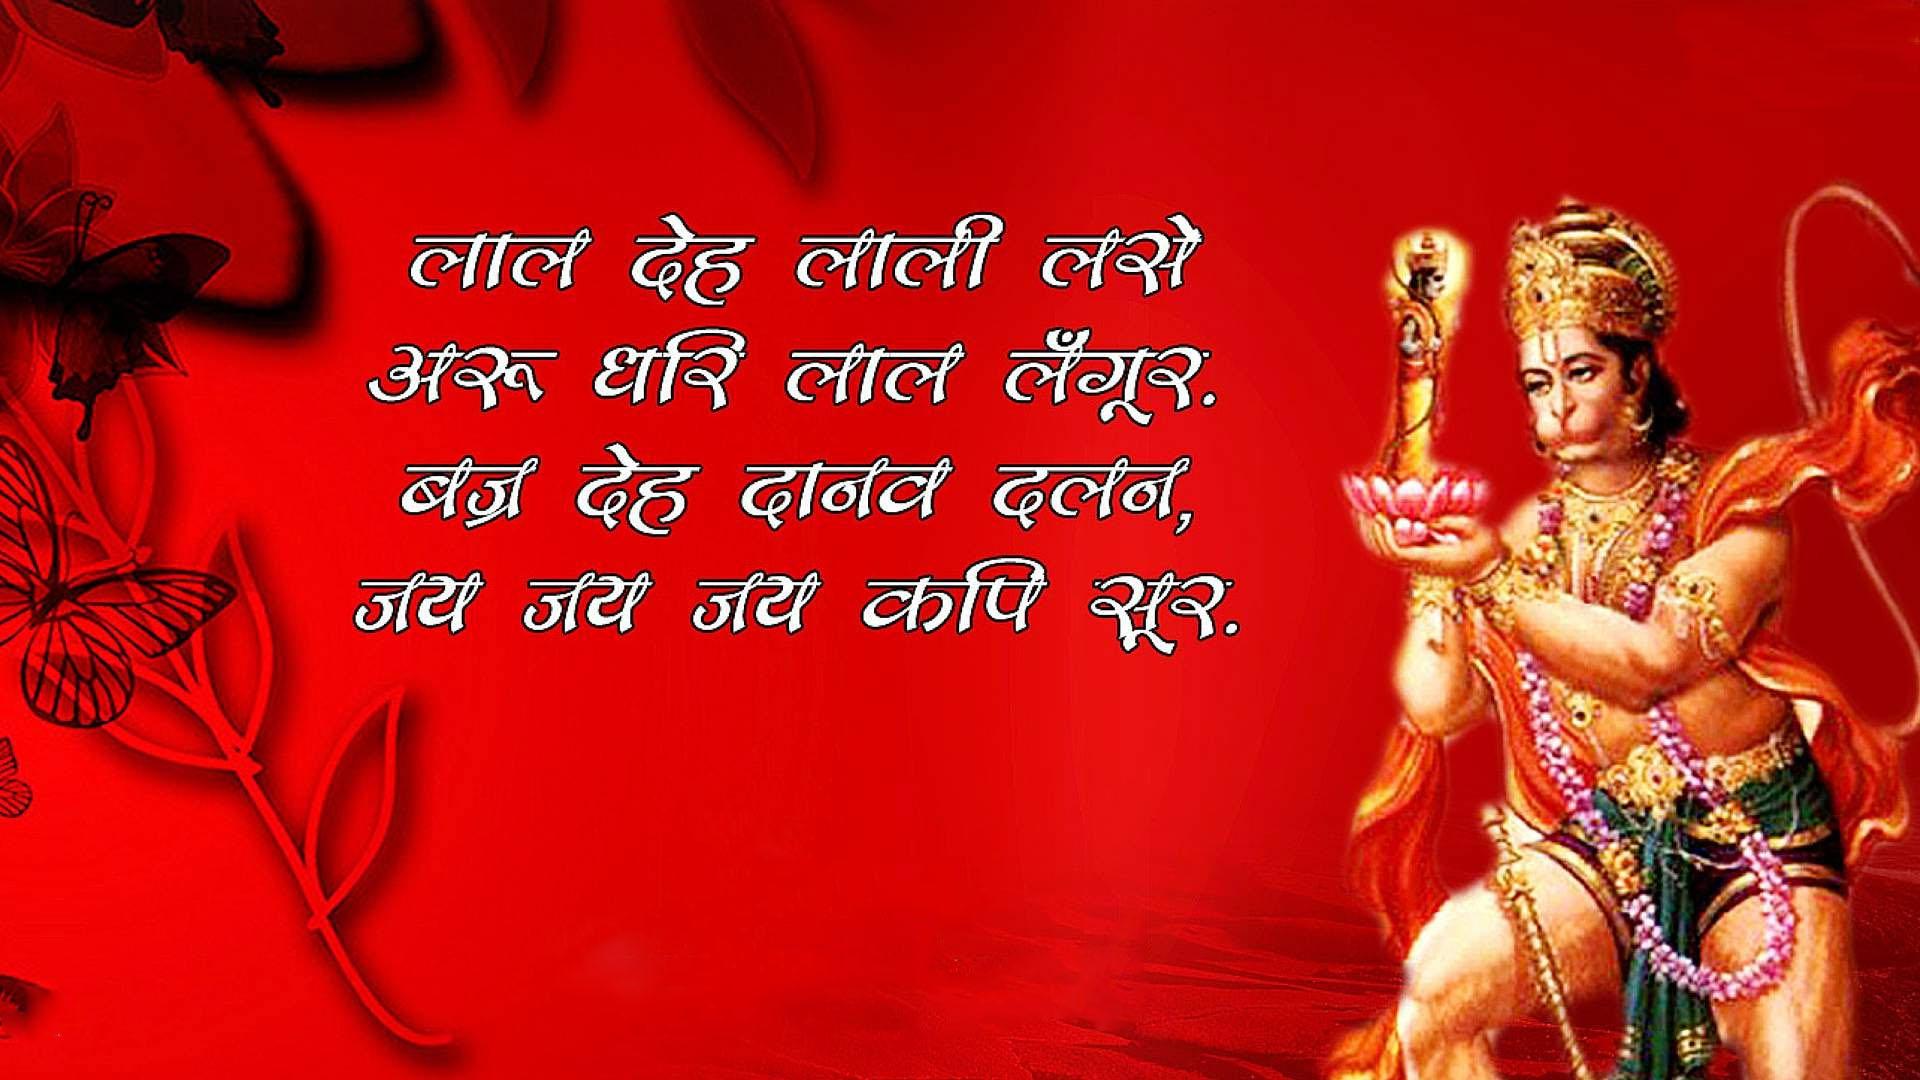 Hindu Mantra Wallpaper Hd